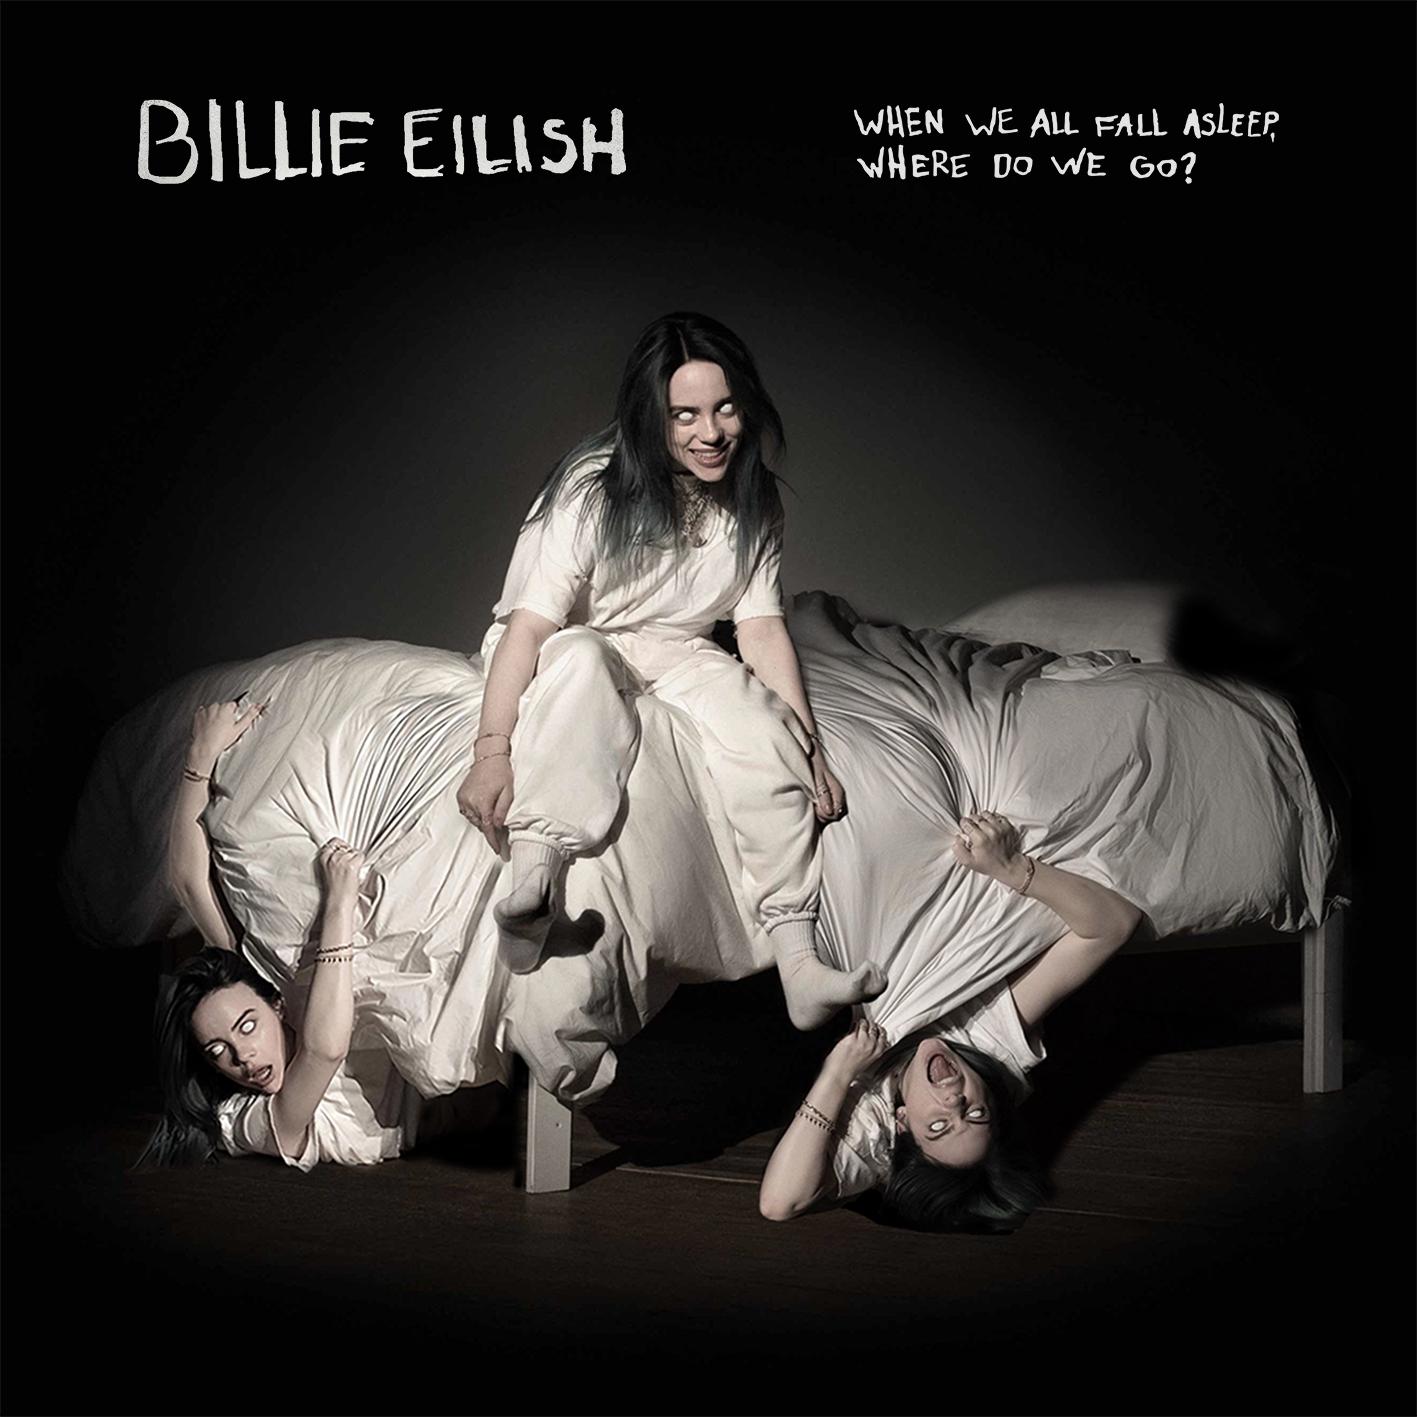 billie-eilish-when-we-all-fall-asleep-wh